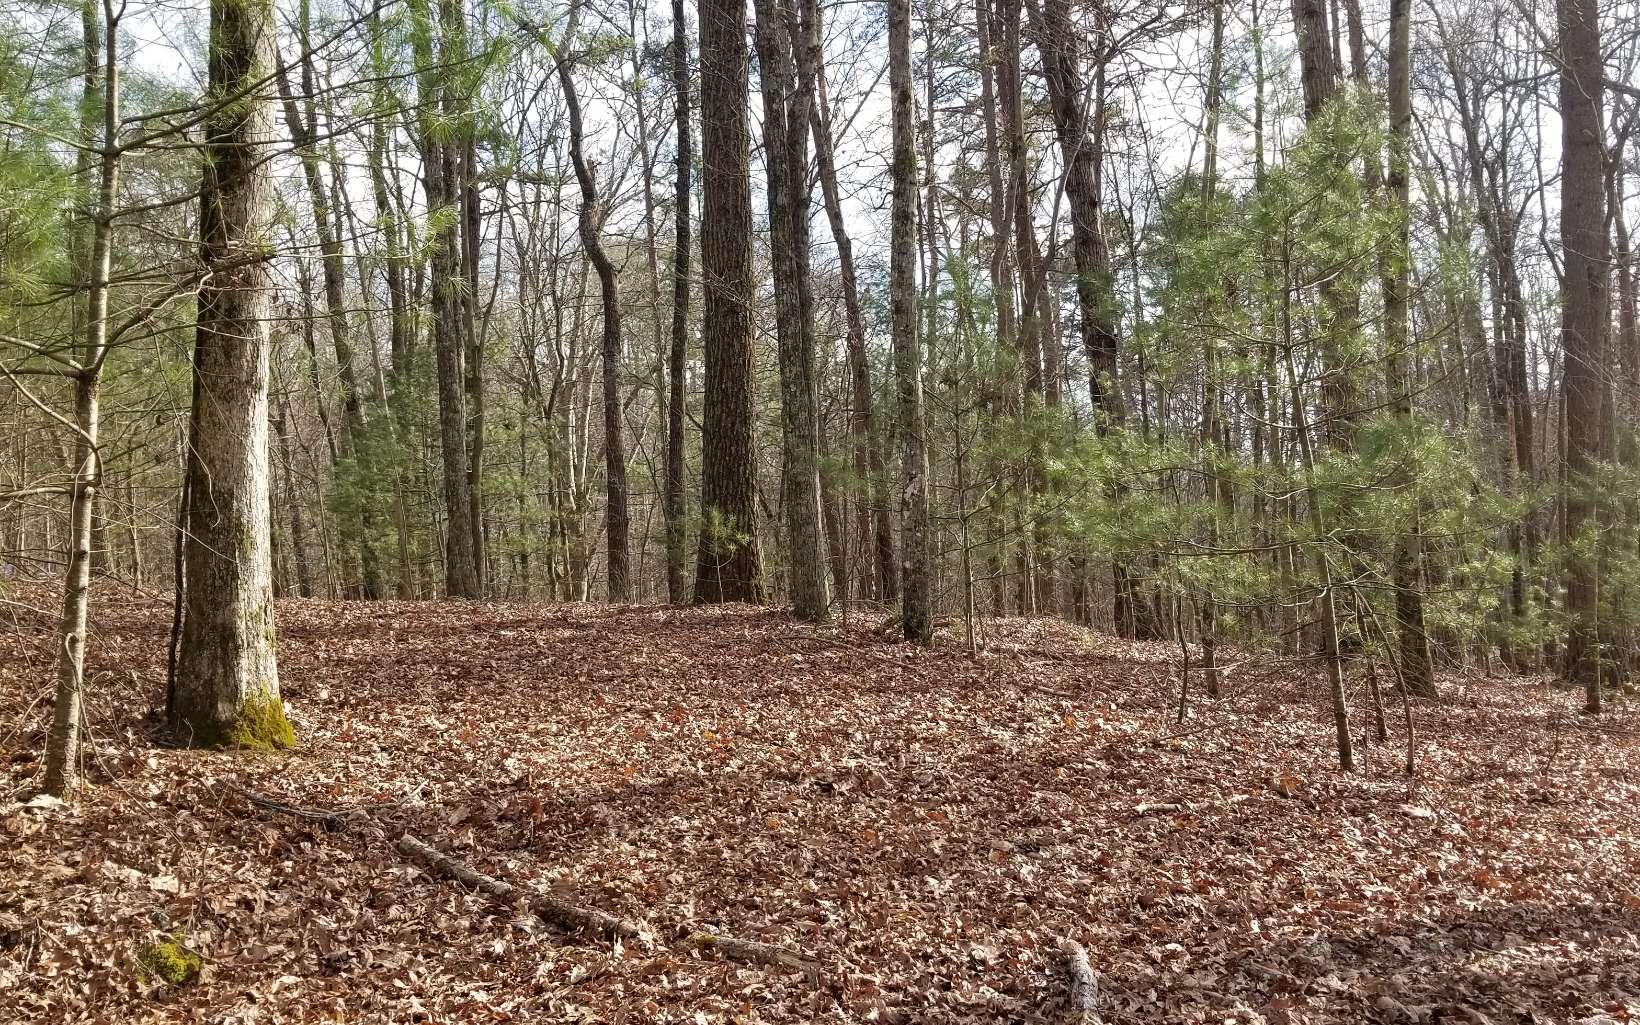 SHADE TREE LANE